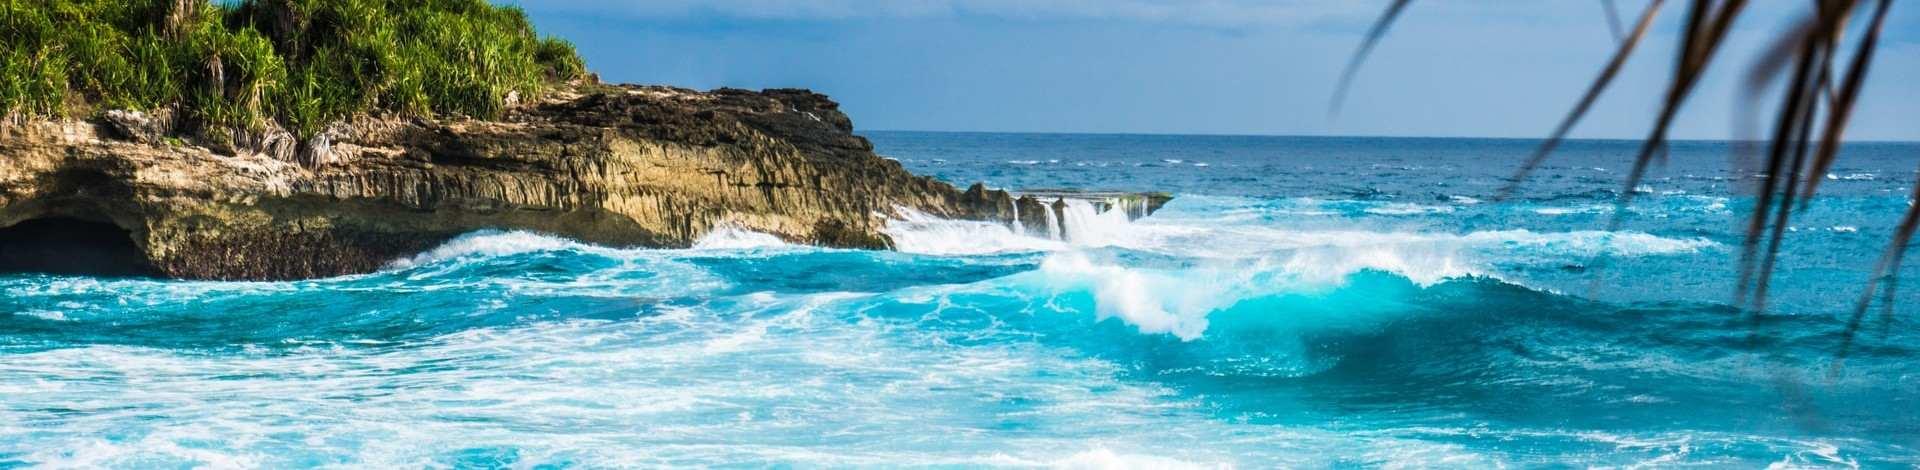 Nusa Lembongan rocher mer turquoise